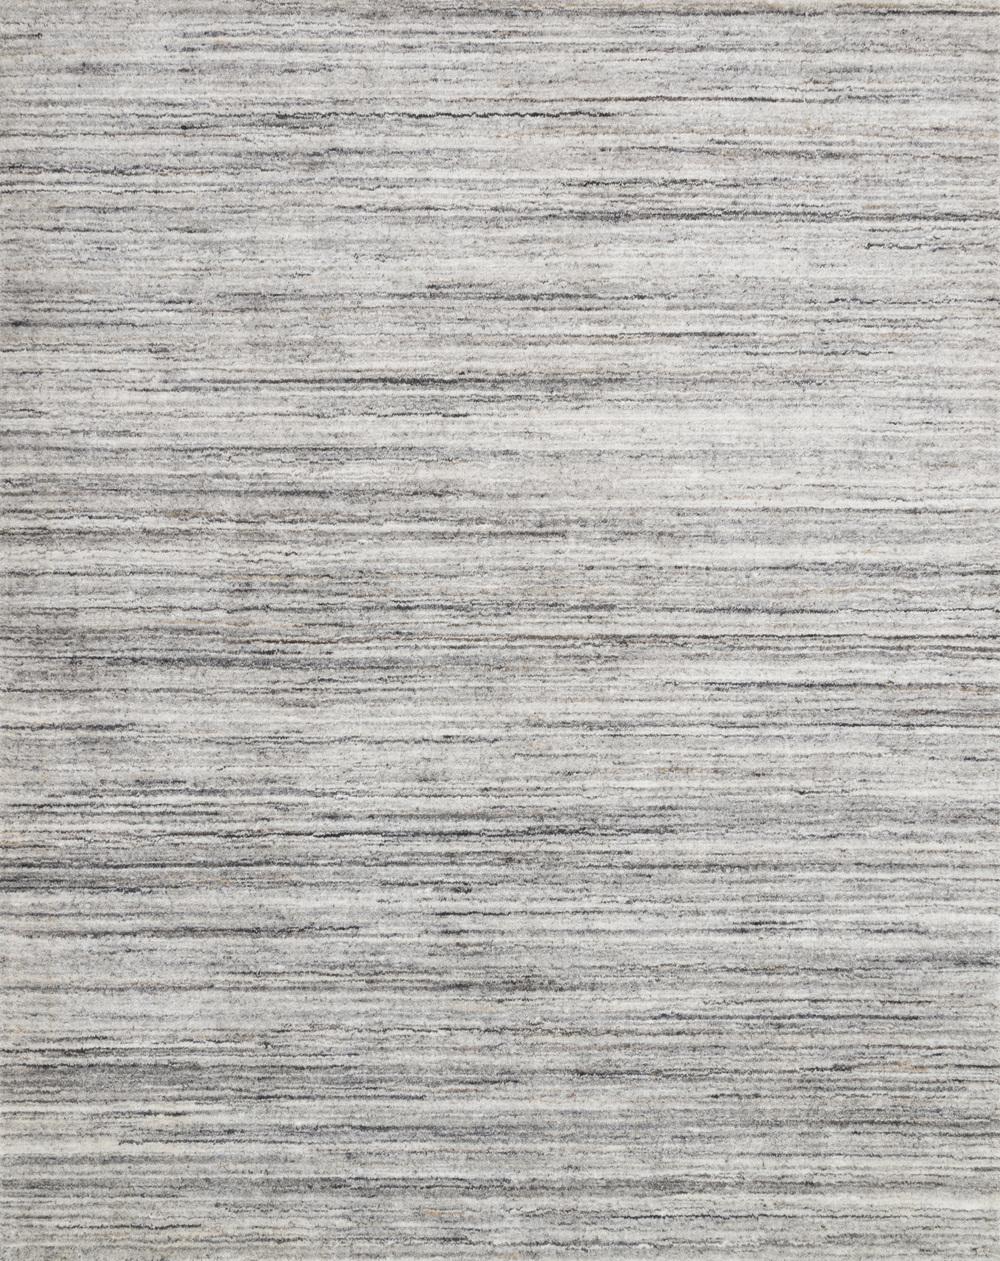 Loloi Rugs - Brandt Rug (Silver/Stone)